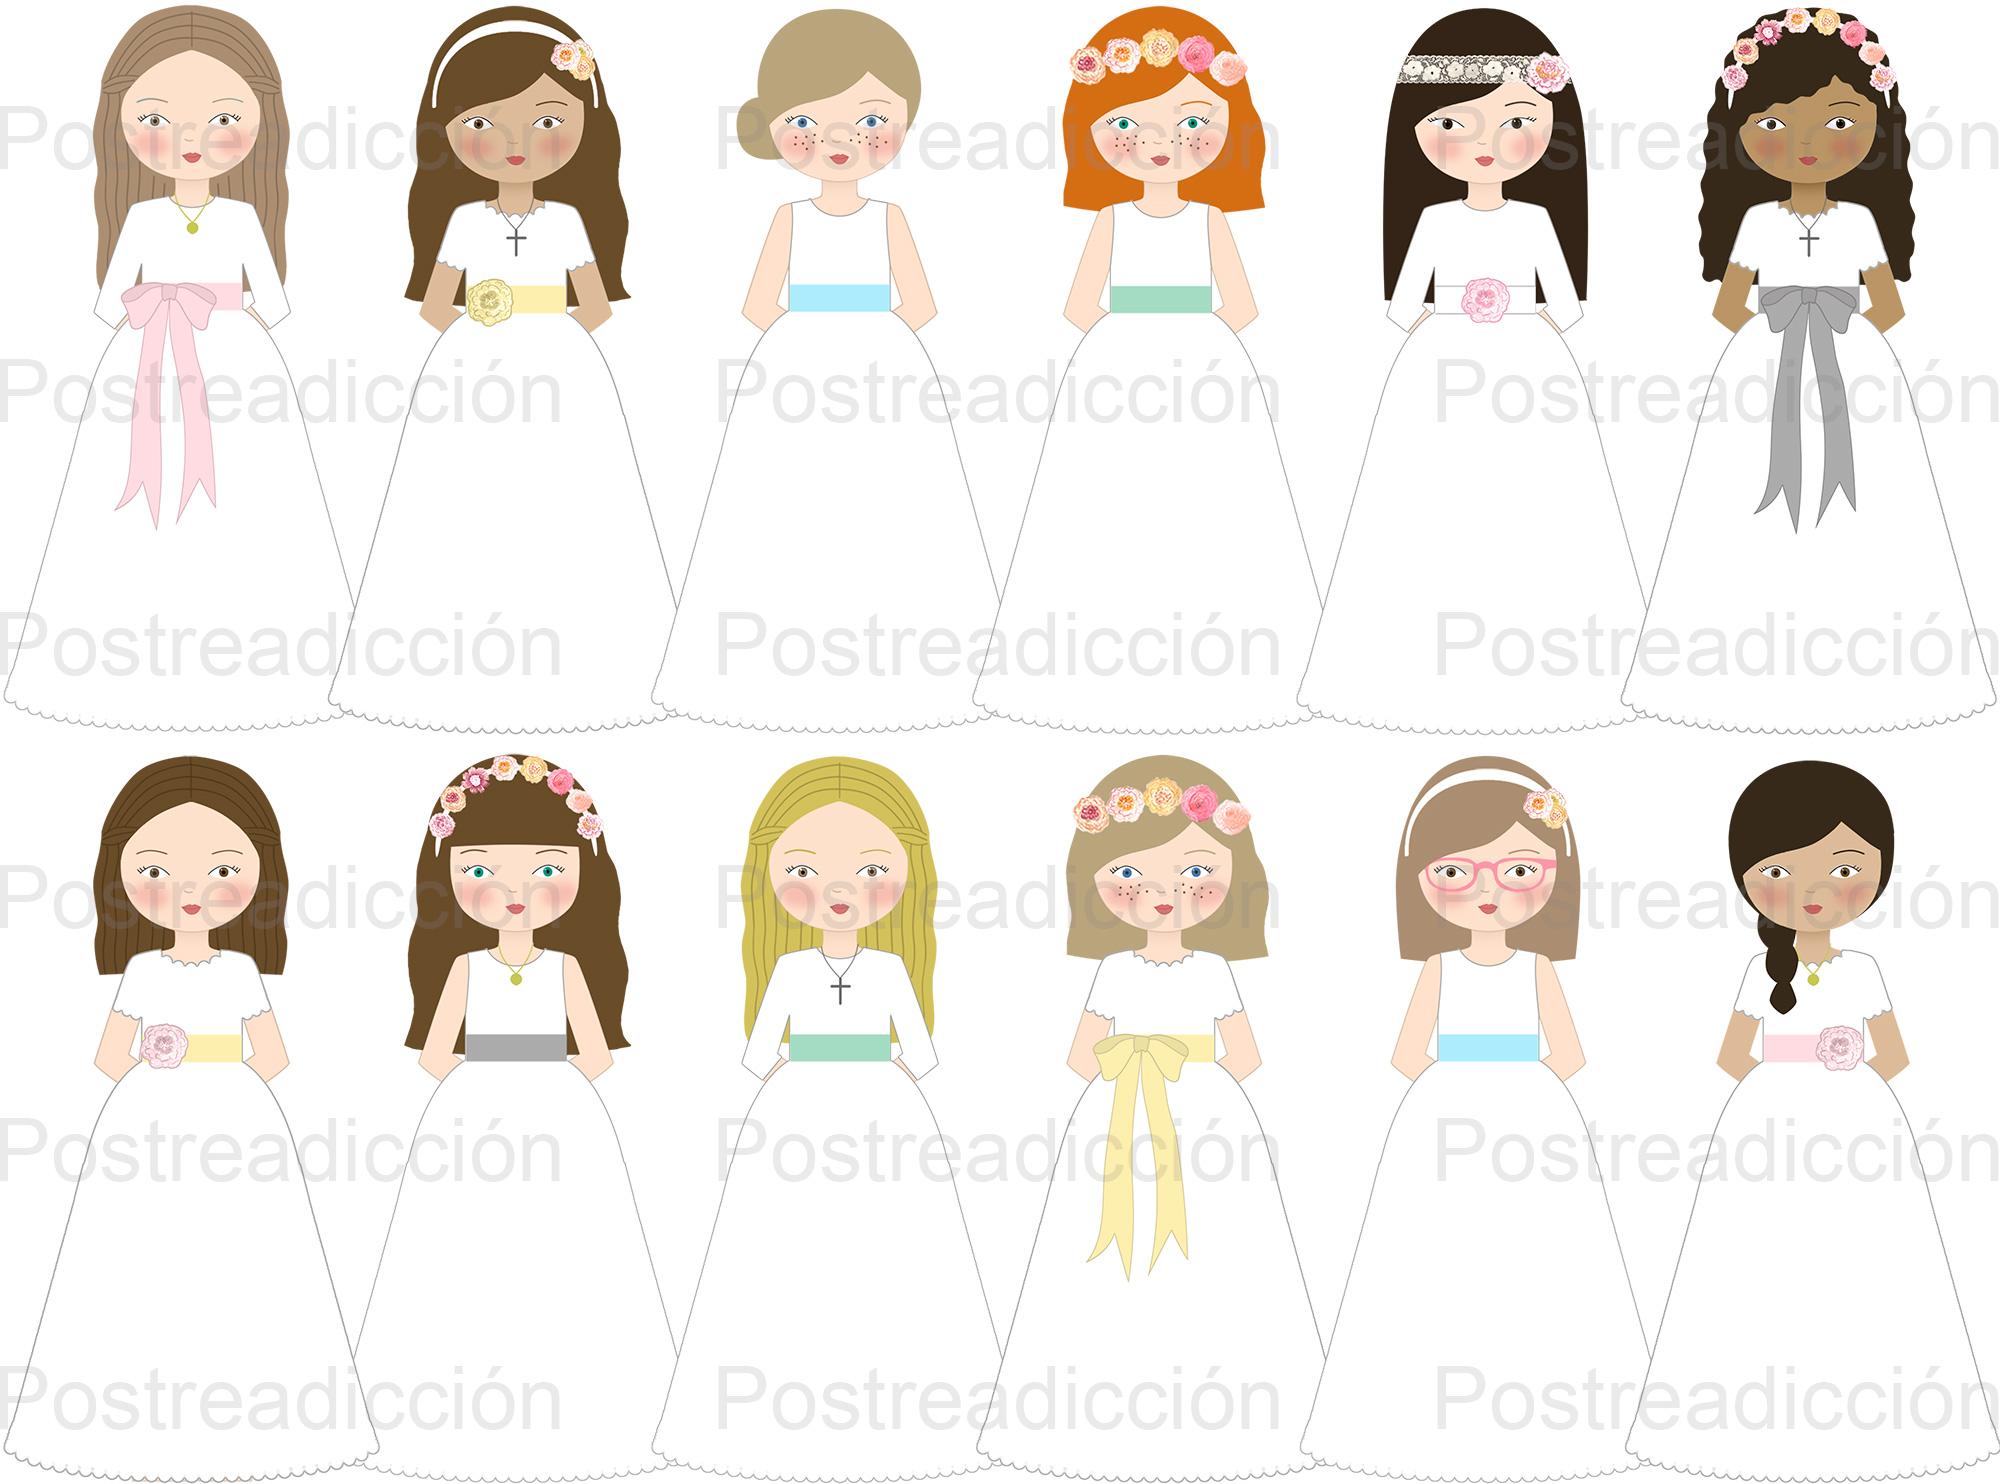 Imagen de producto: https://tienda.postreadiccion.com/img/articulos/secundarias14019-kit-imprimible-de-comunion-carlota-liberty-eloise-c-1.jpg